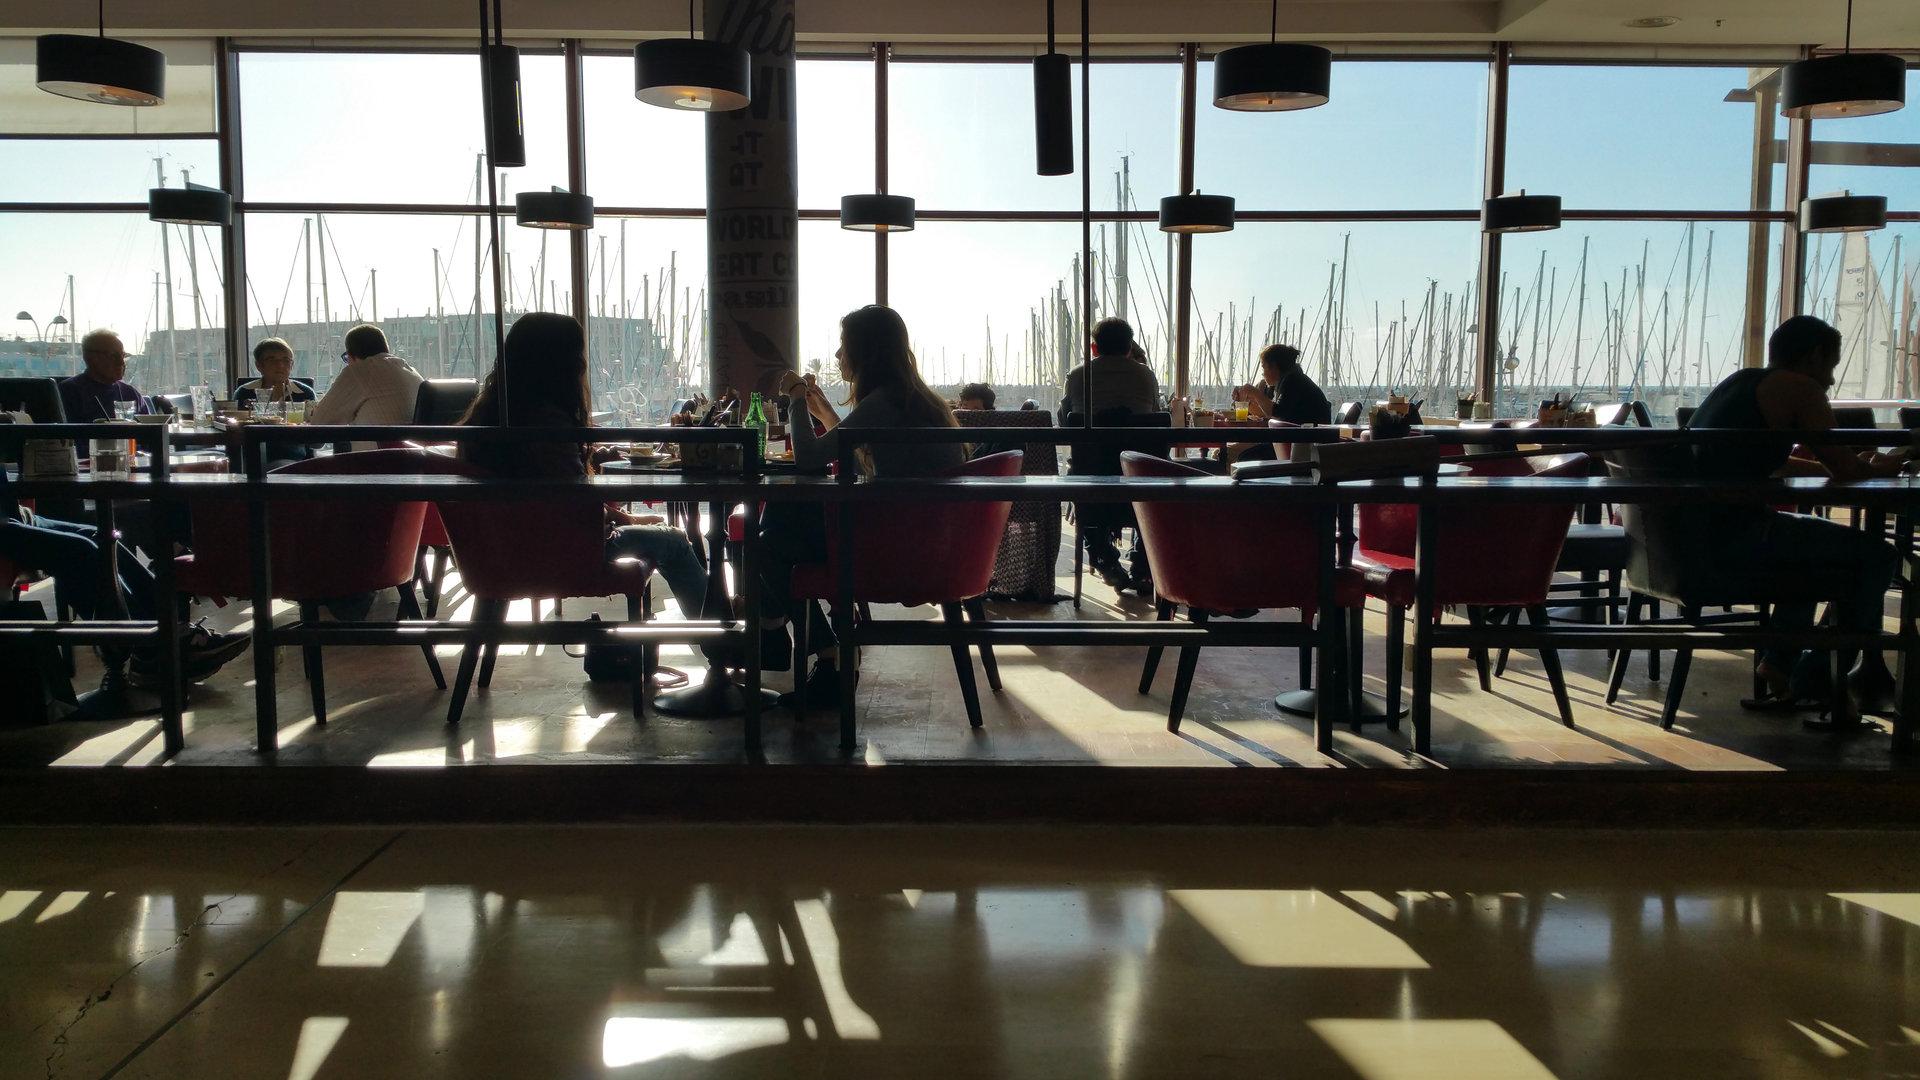 silhouette-people-interior-restaurant-ba